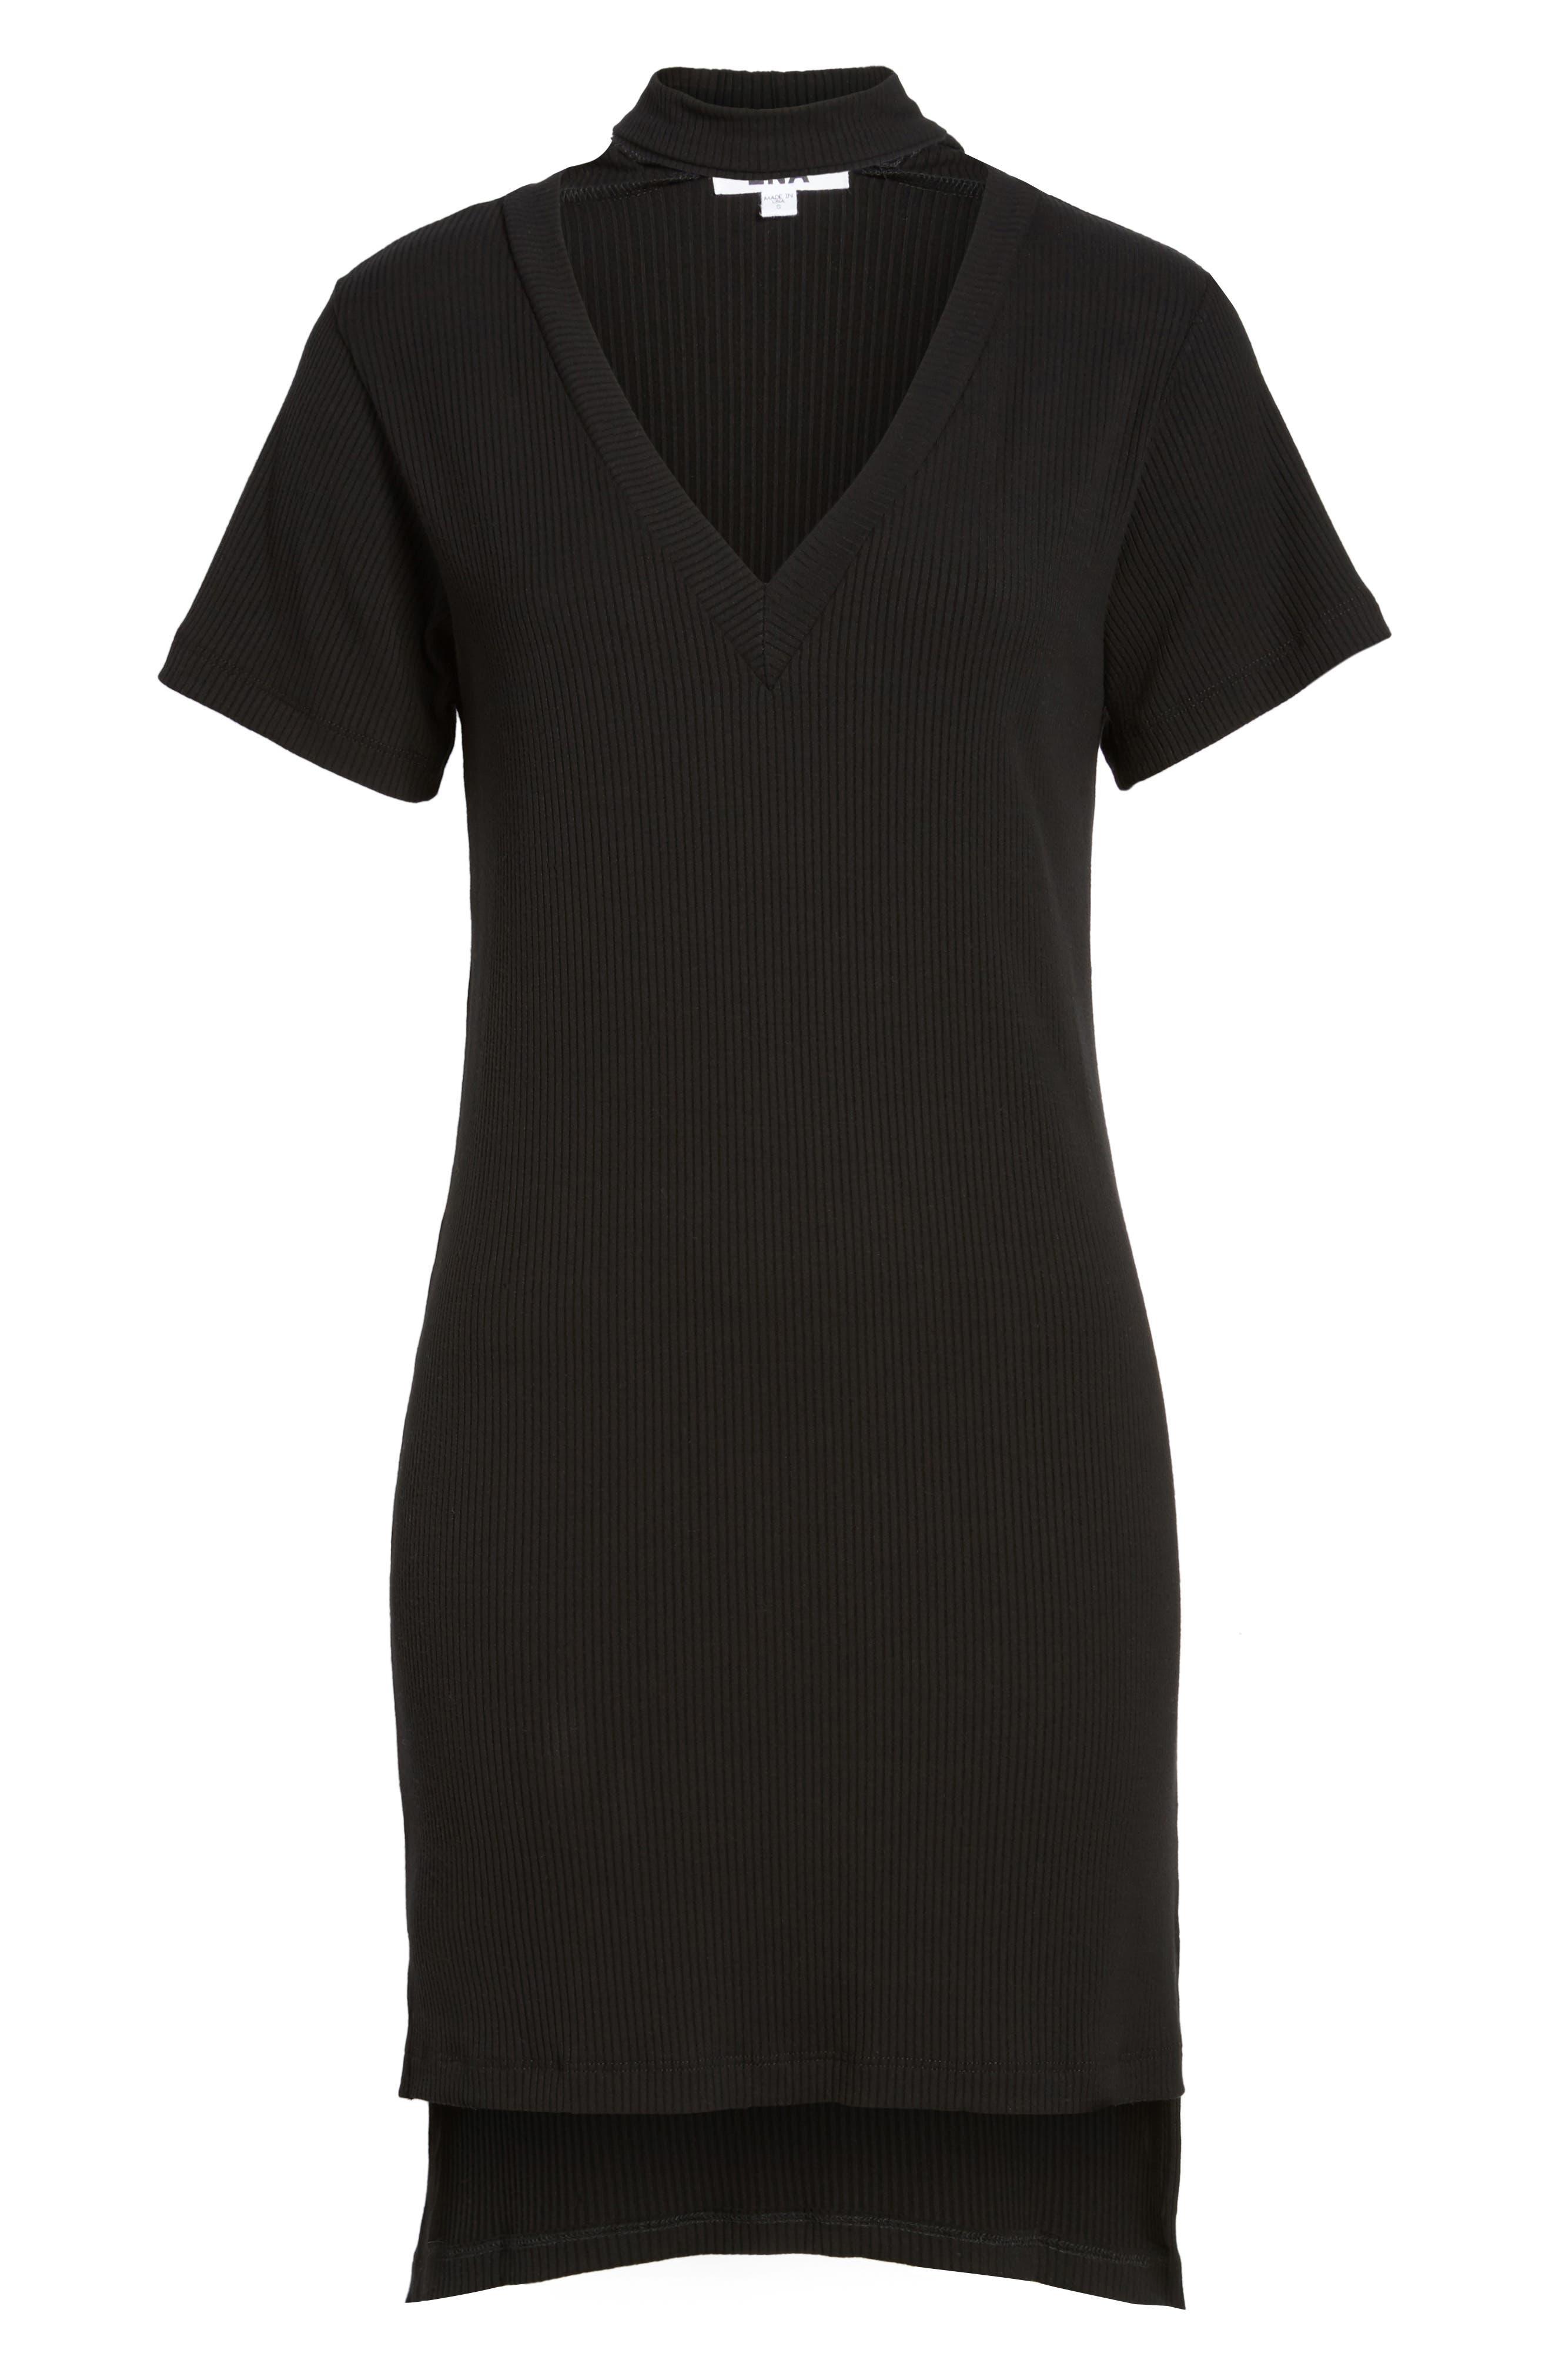 Klassen Choker Dress,                             Alternate thumbnail 6, color,                             001